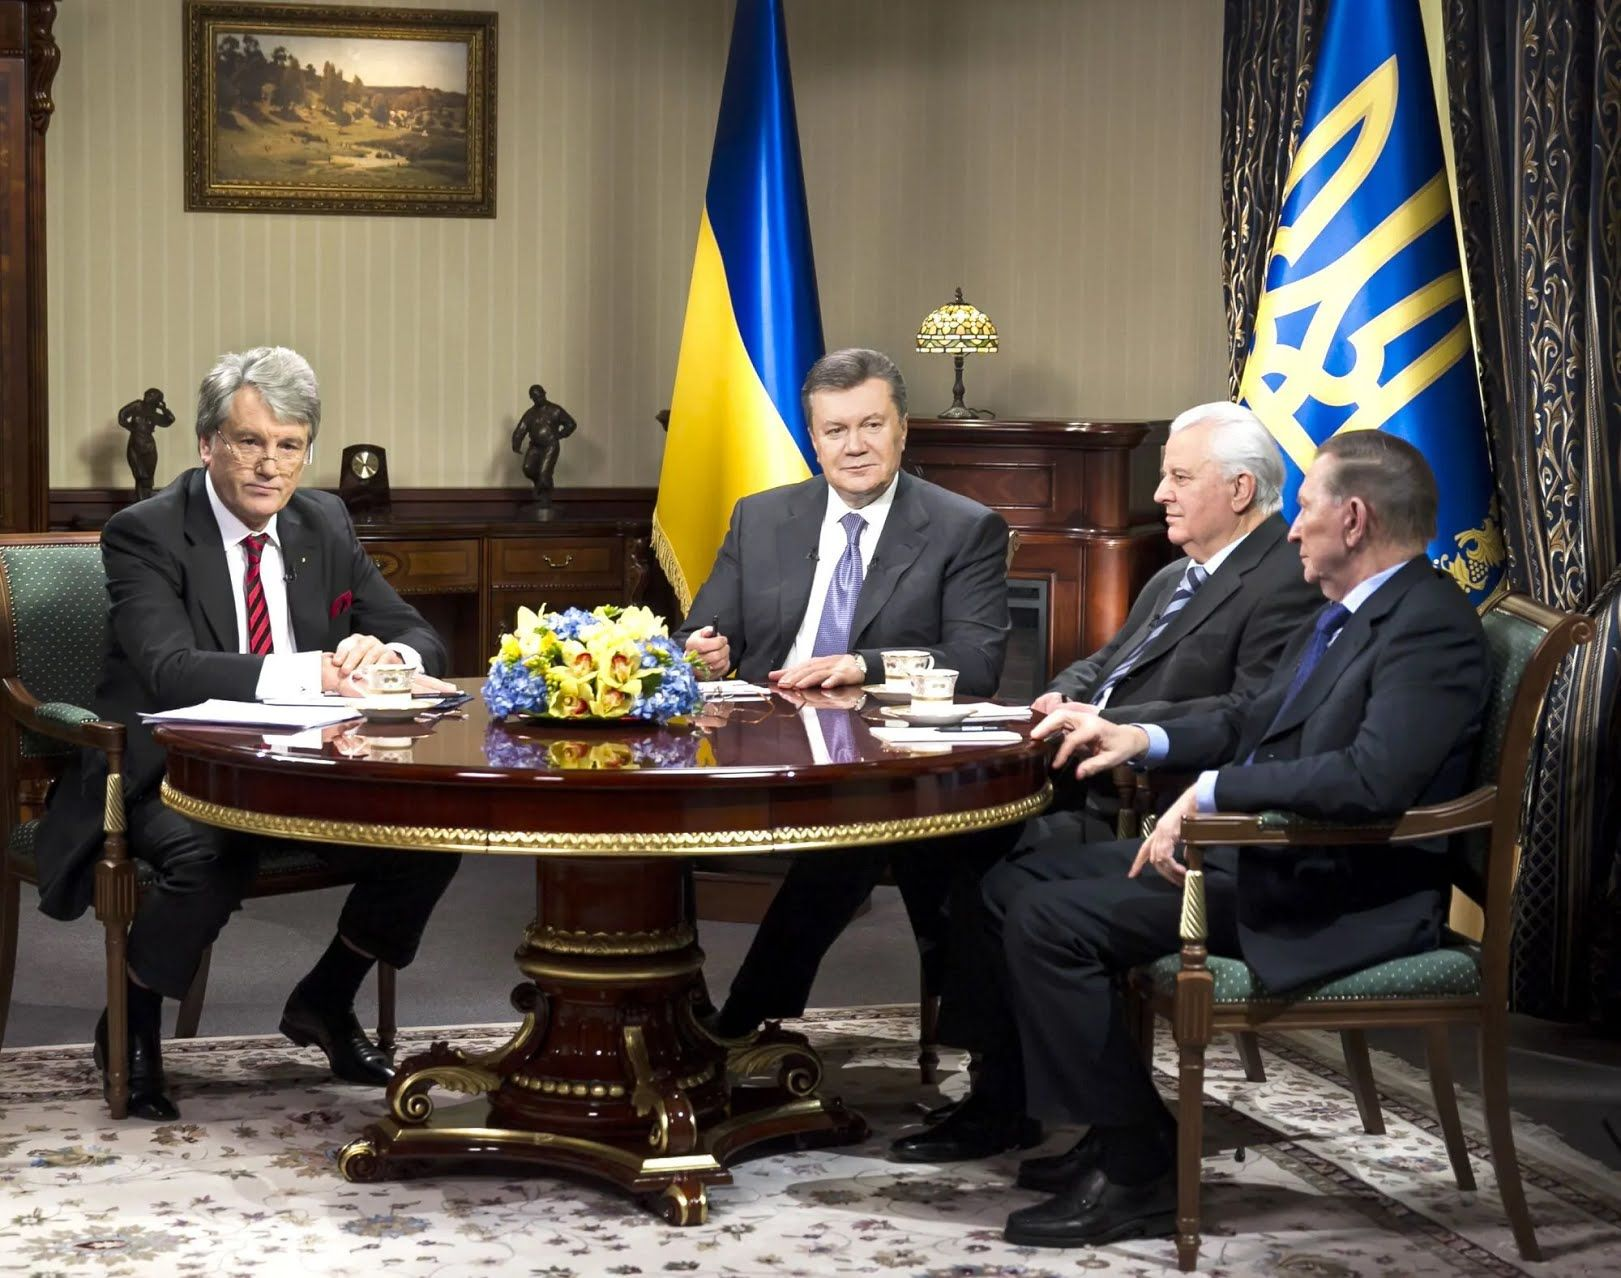 Четыре президента Украины Виктор Ющенко, Виктор Янукович, Леонид Кравчук и Леонид Кучма